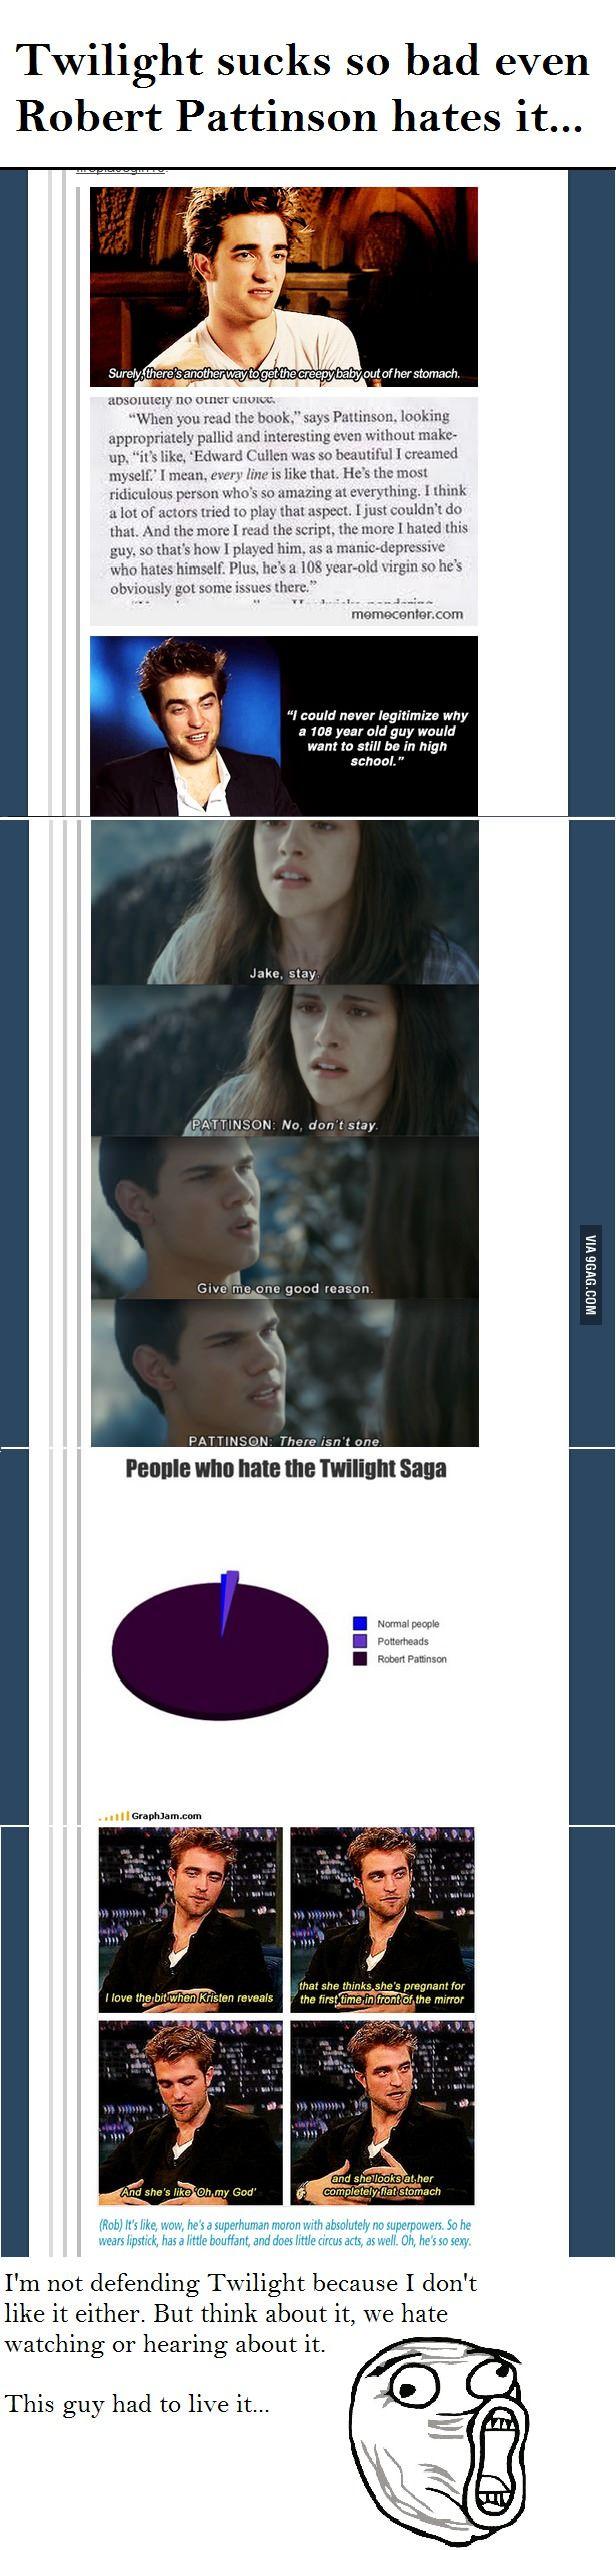 Even Robert Pattinson hates Twilight. This makes me happy @Amanda Snelson Snelson McBride